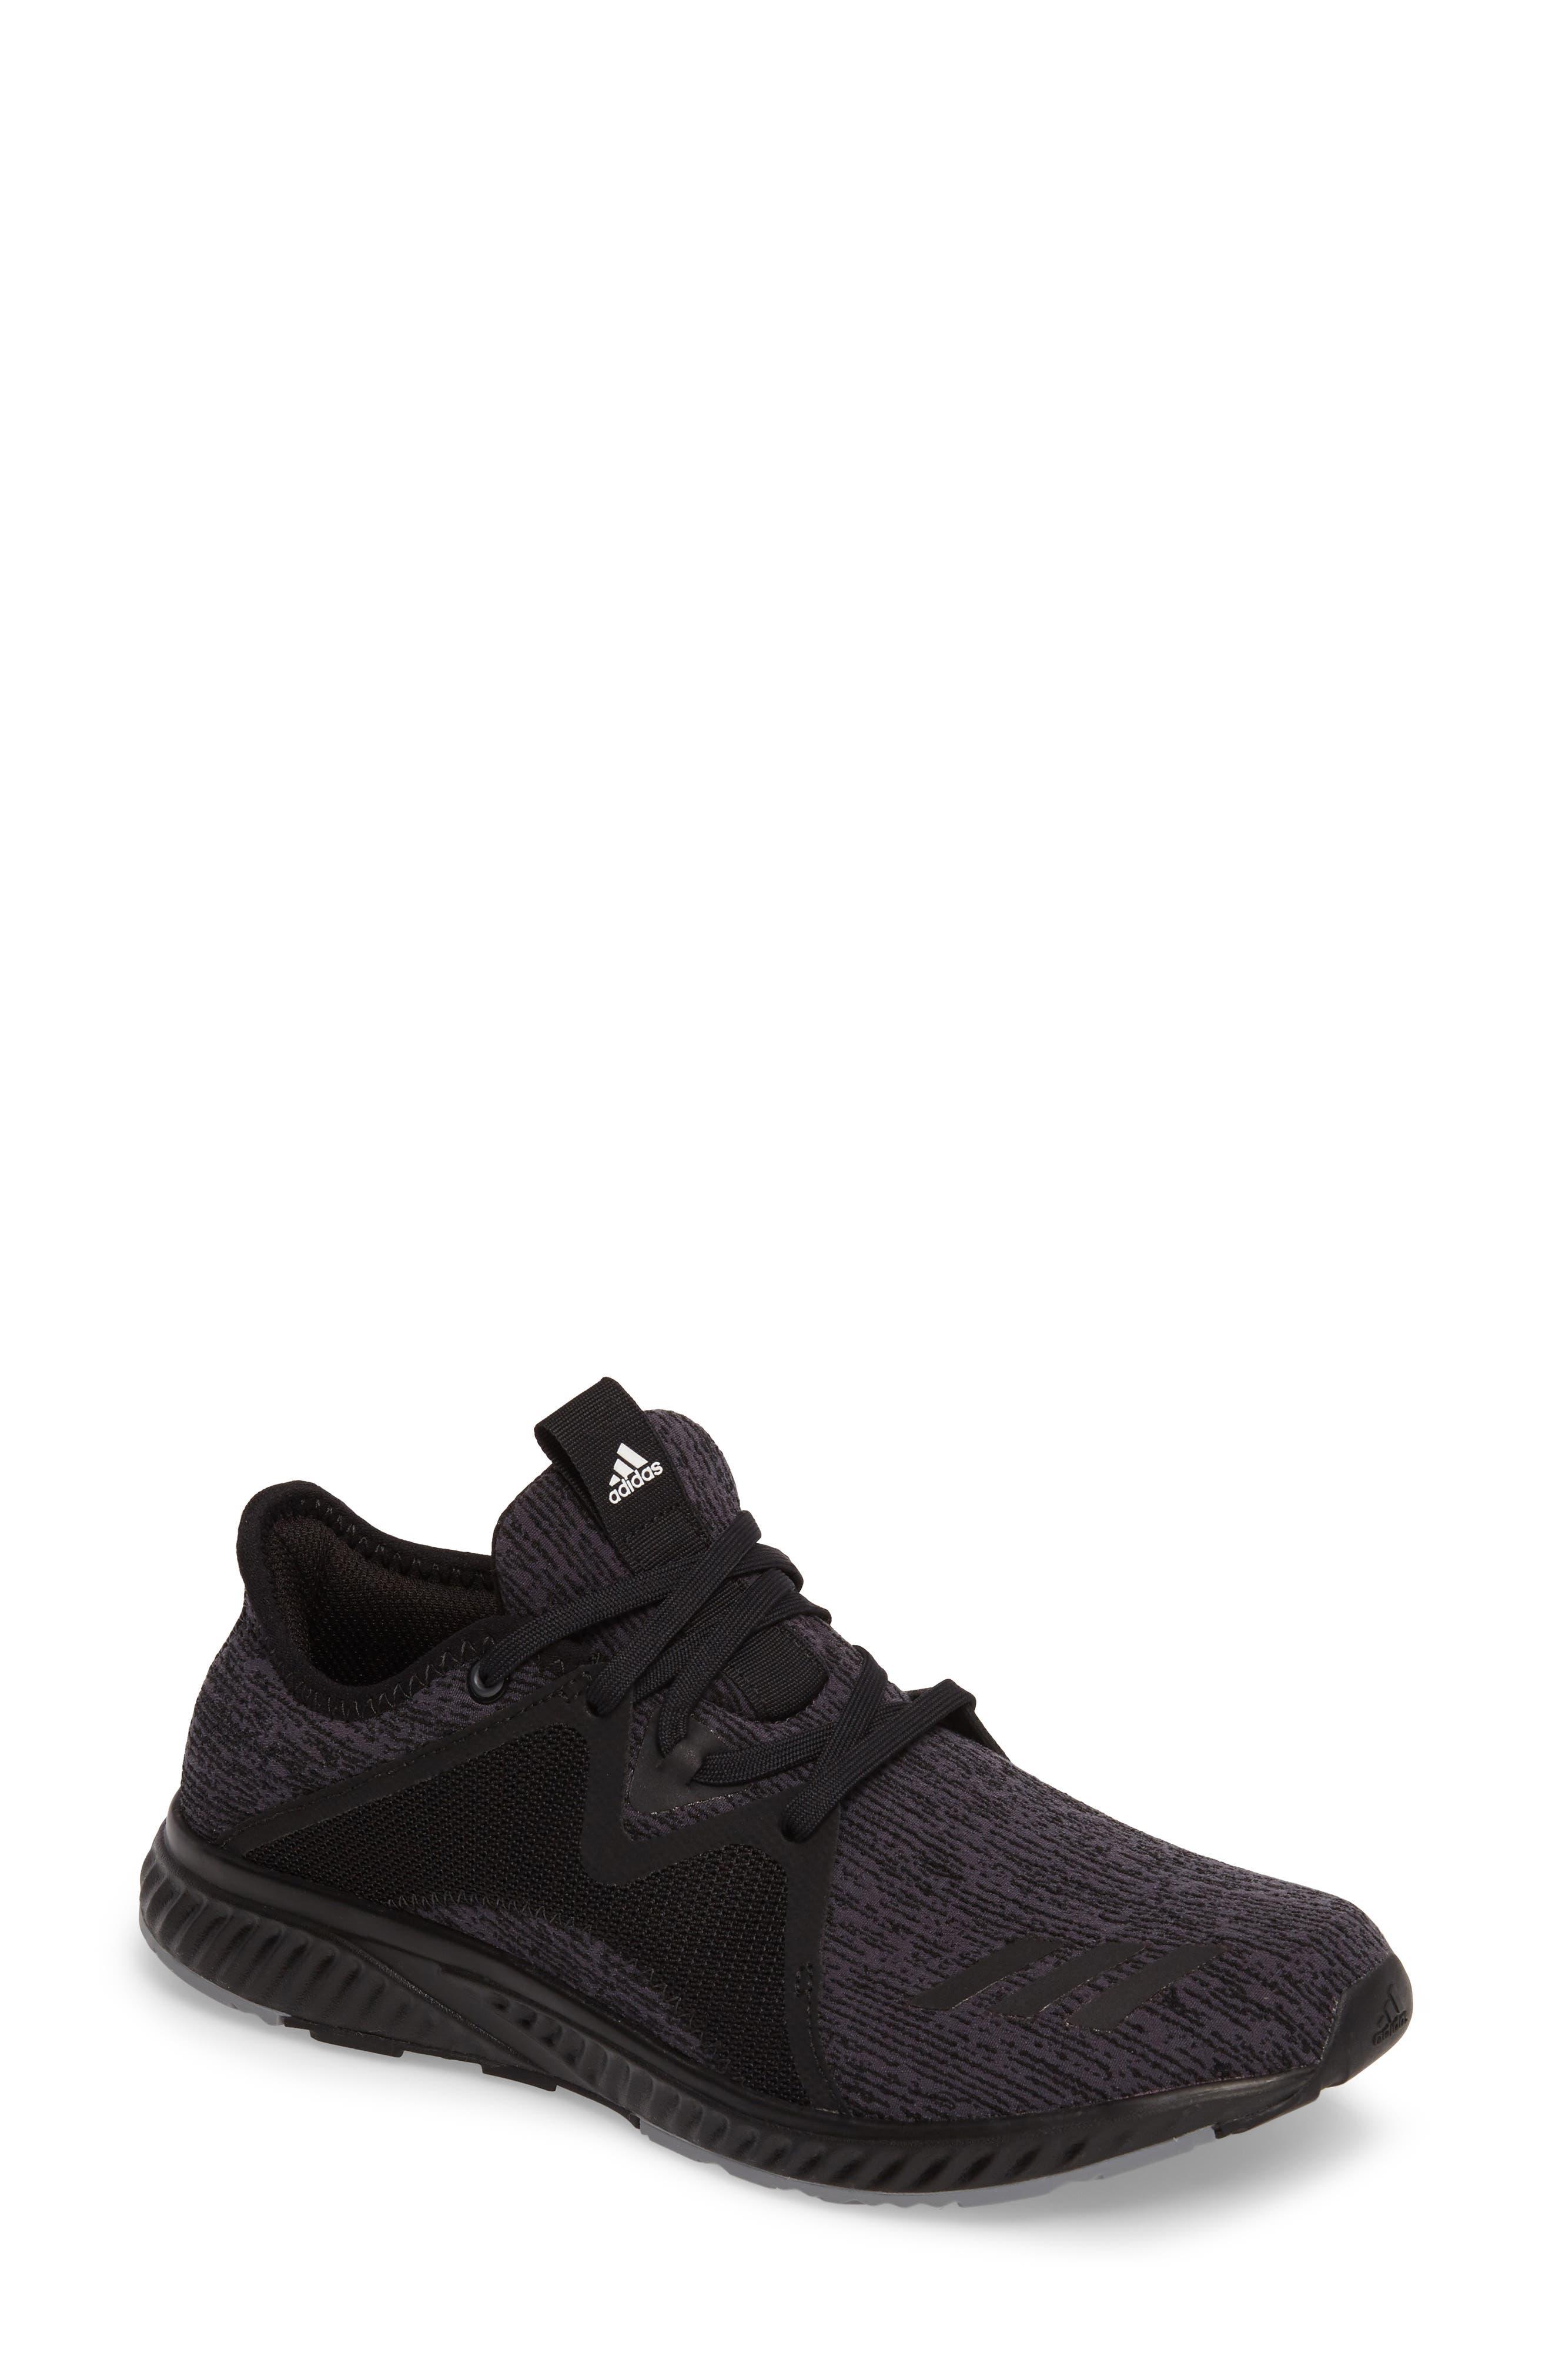 Main Image - adidas Edge Lux 2.0 Running Shoe (Women)